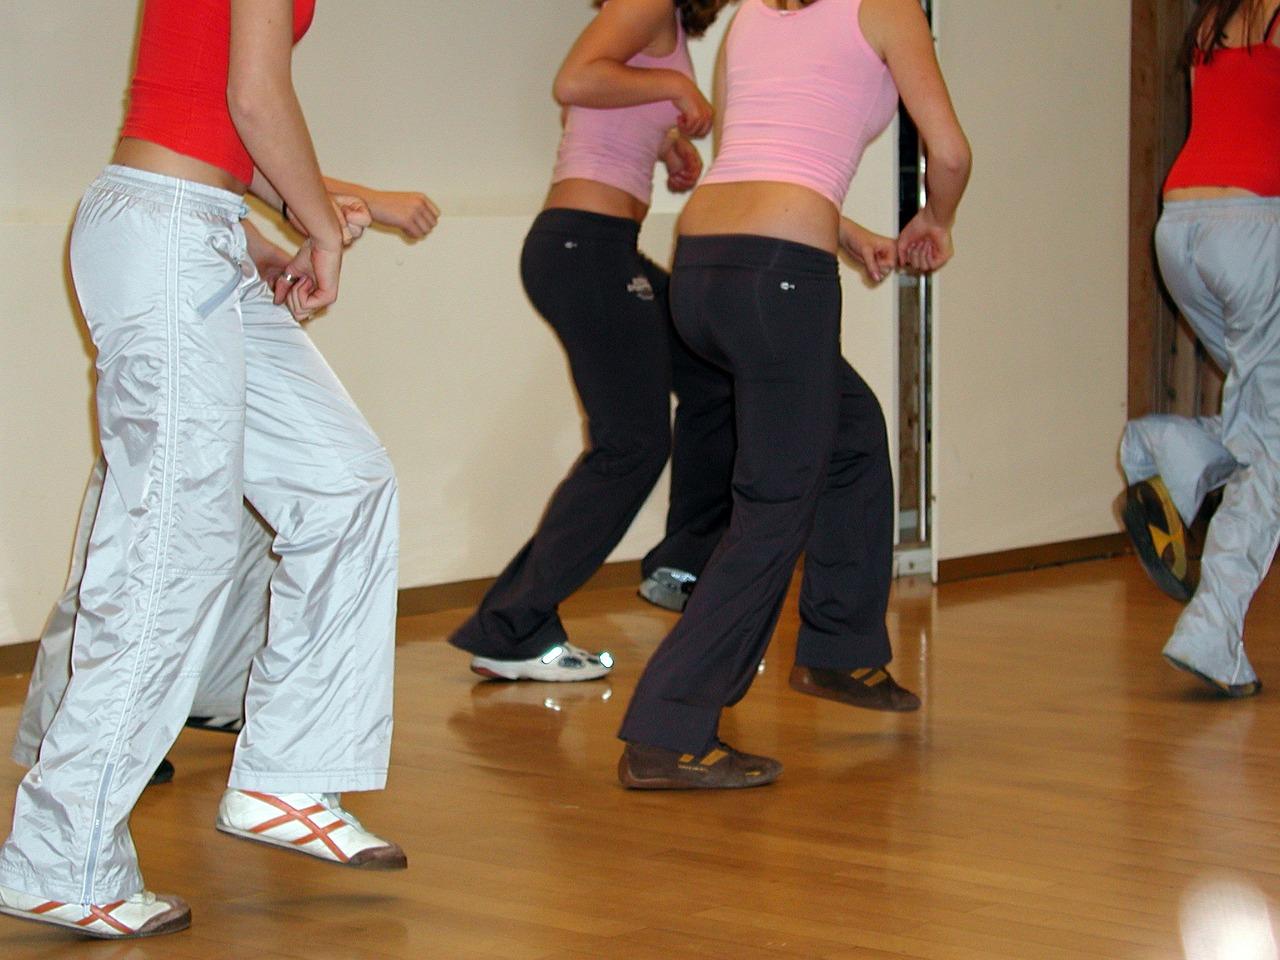 aerobics-501012_1280